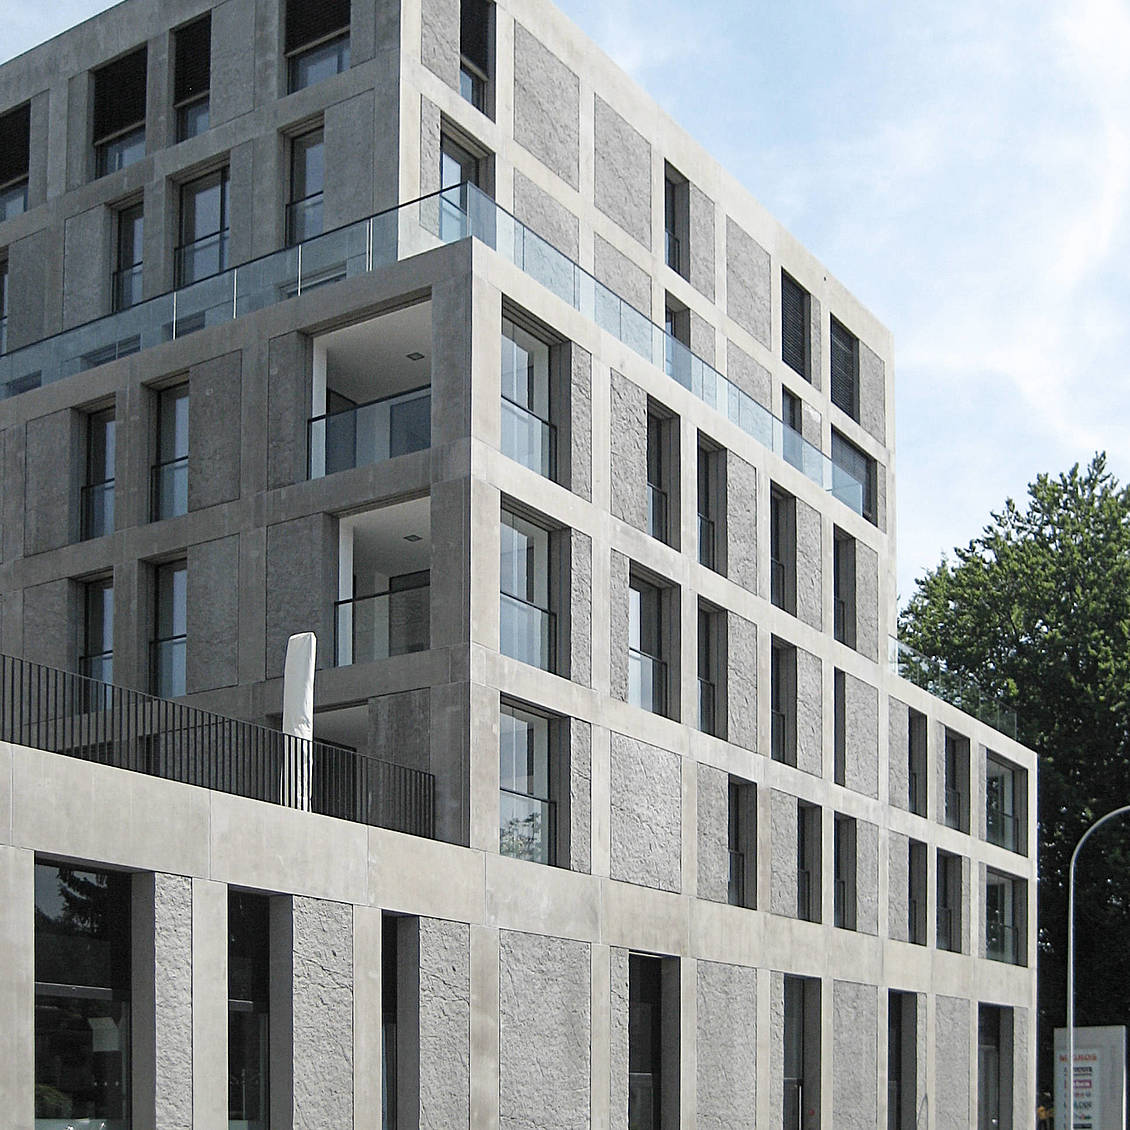 reckli 2 122 yukon reckli design your concrete. Black Bedroom Furniture Sets. Home Design Ideas